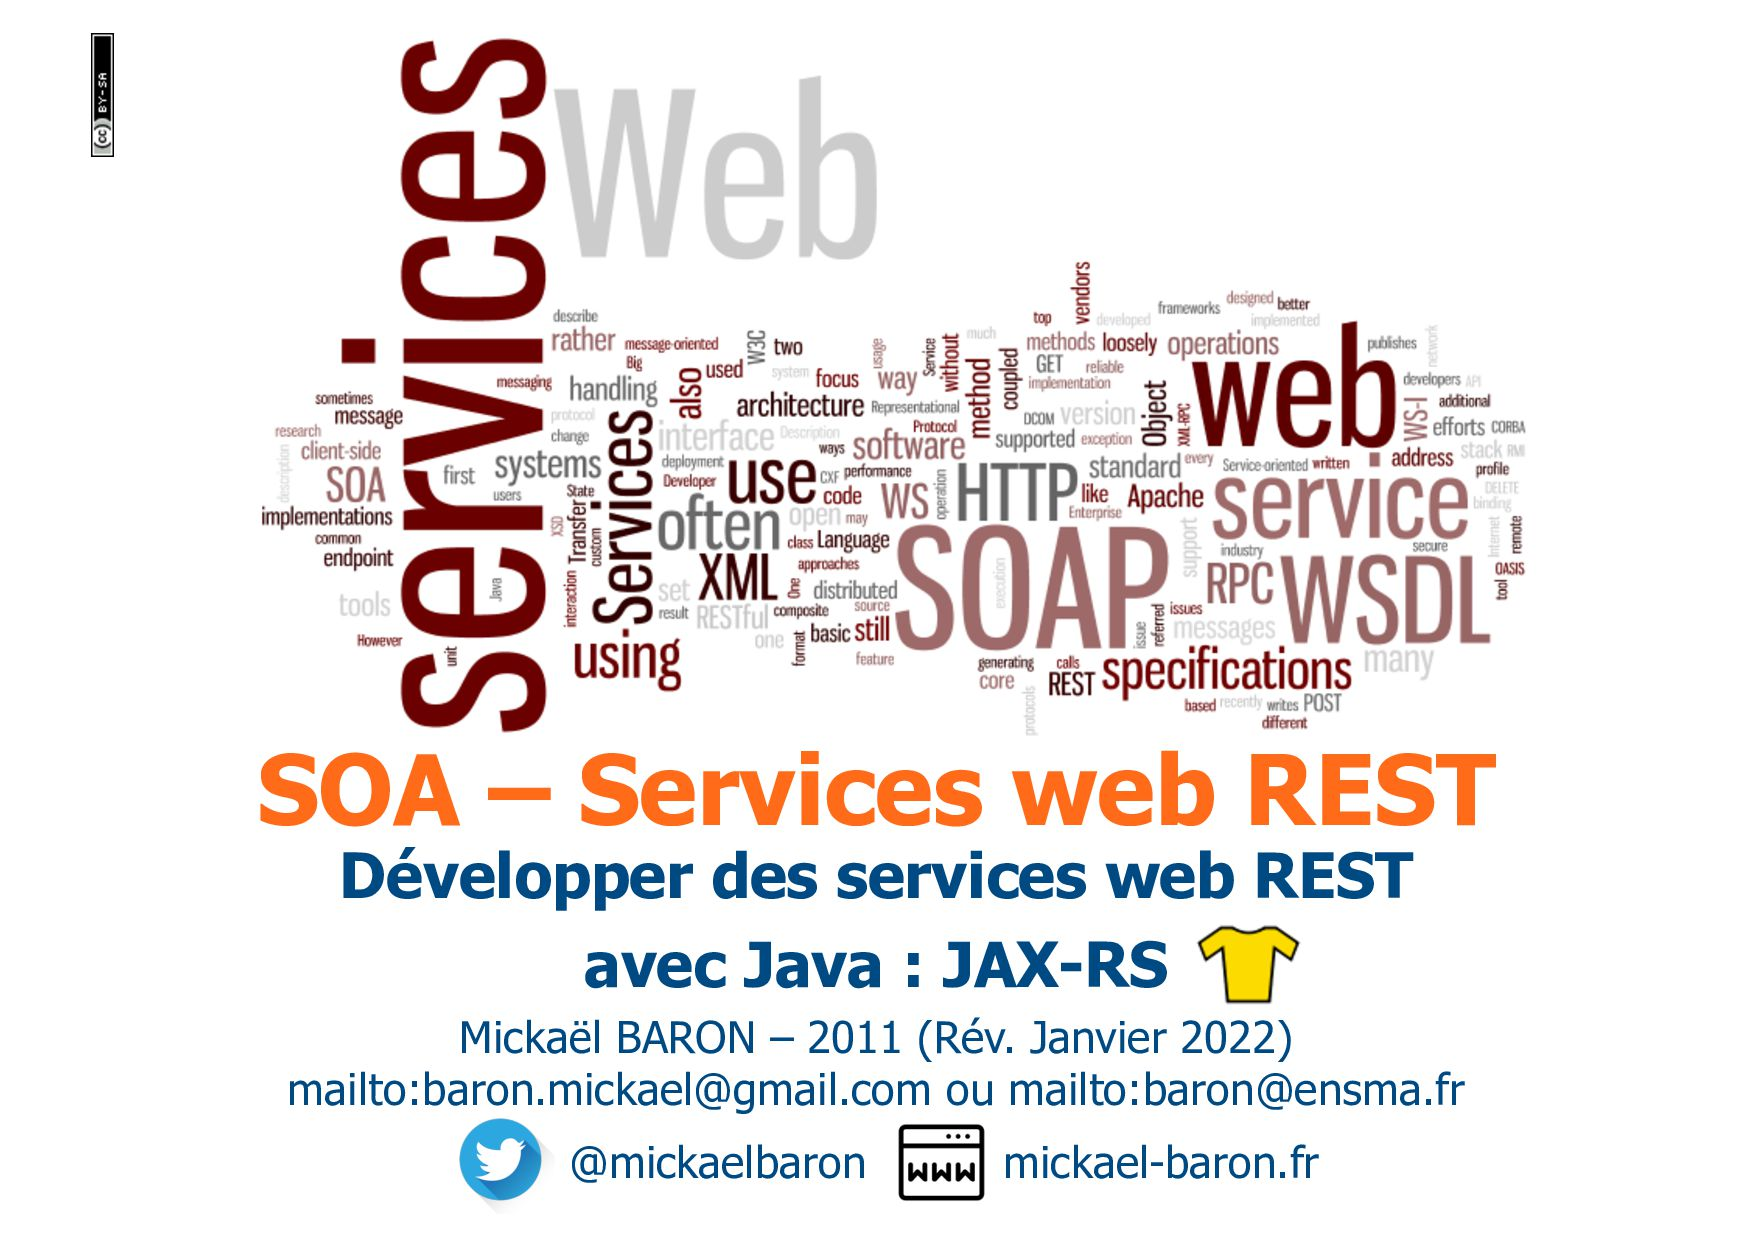 SOA – Services web REST Mickaël BARON – 2011 (R...